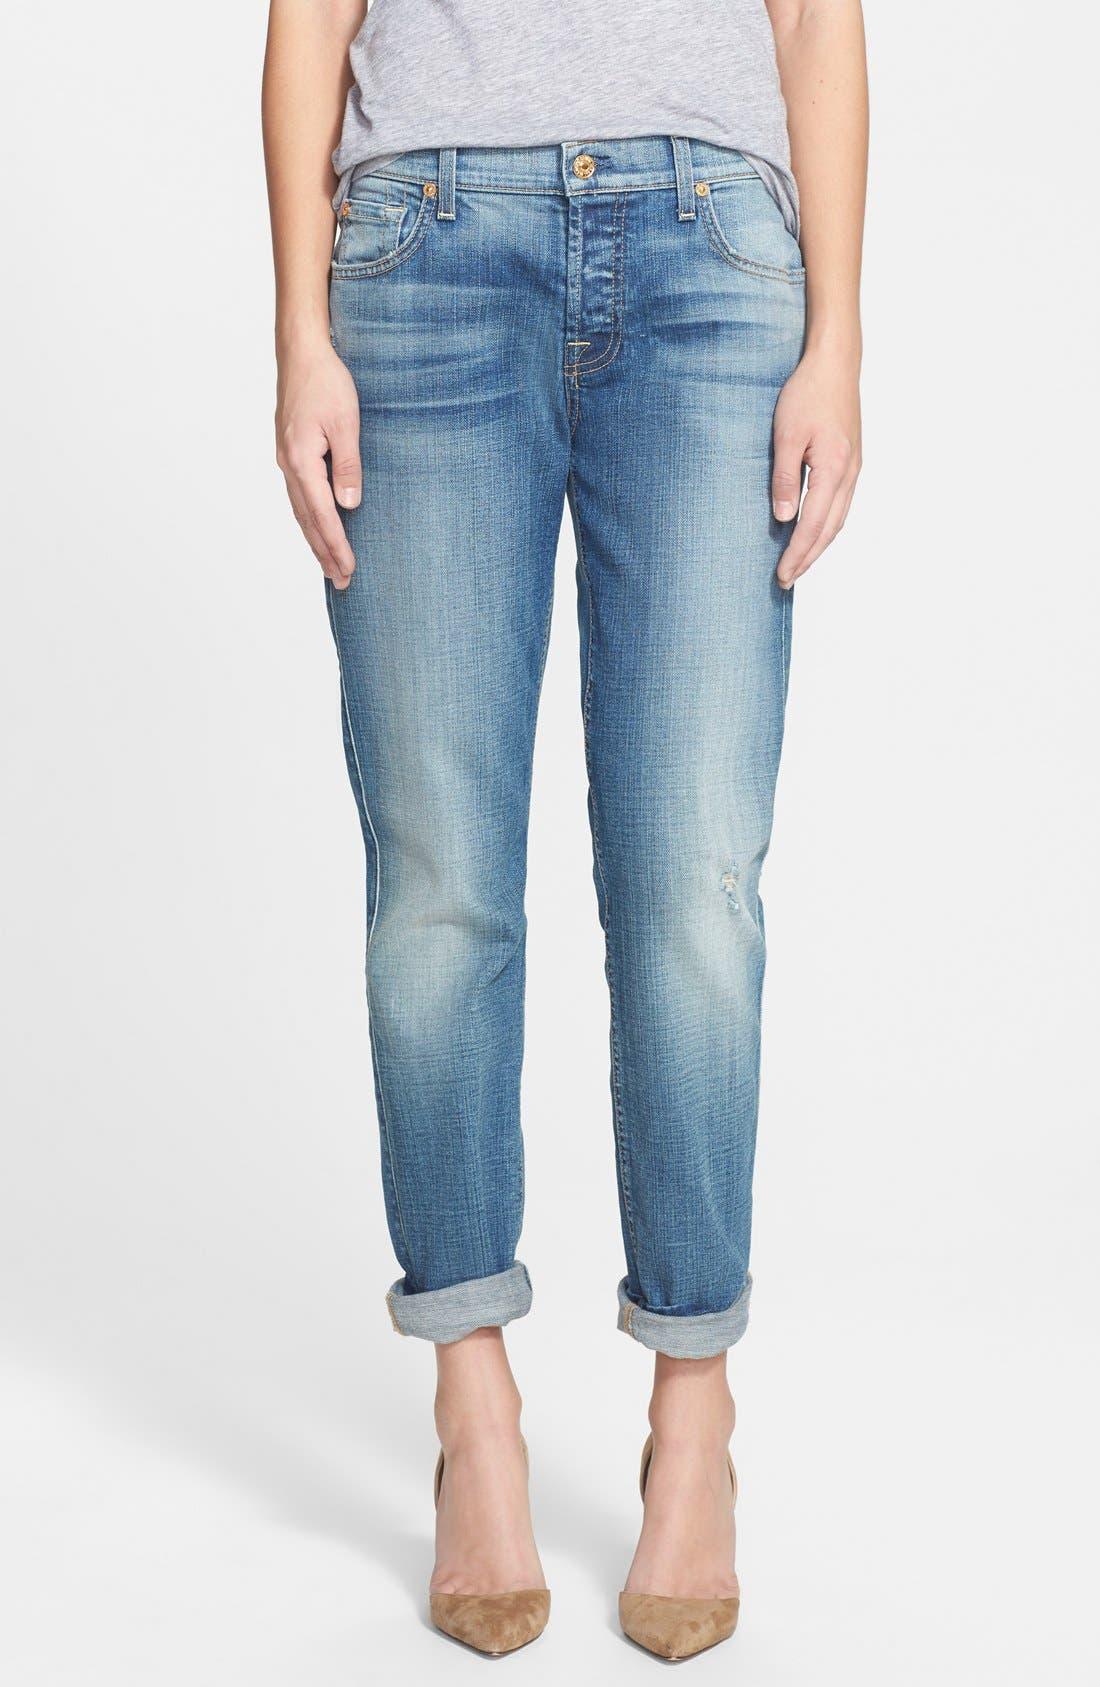 Alternate Image 1 Selected - 7 For All Mankind® 'Josefina' Boyfriend Jeans (Aggressive Atlas Blue)